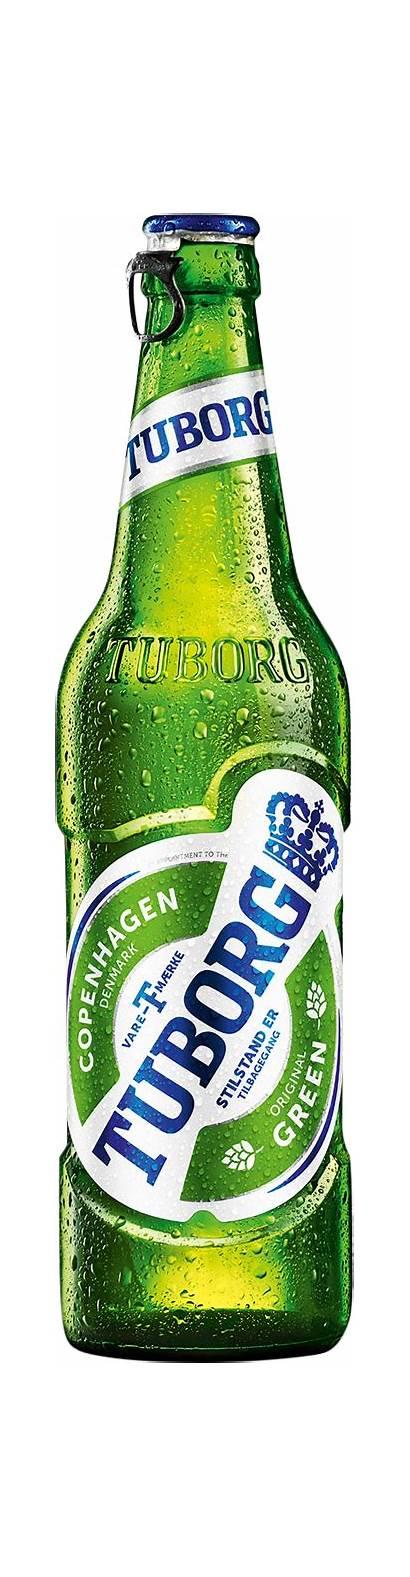 Tuborg Strong Beer Ml Premium Carlsberg Brewing